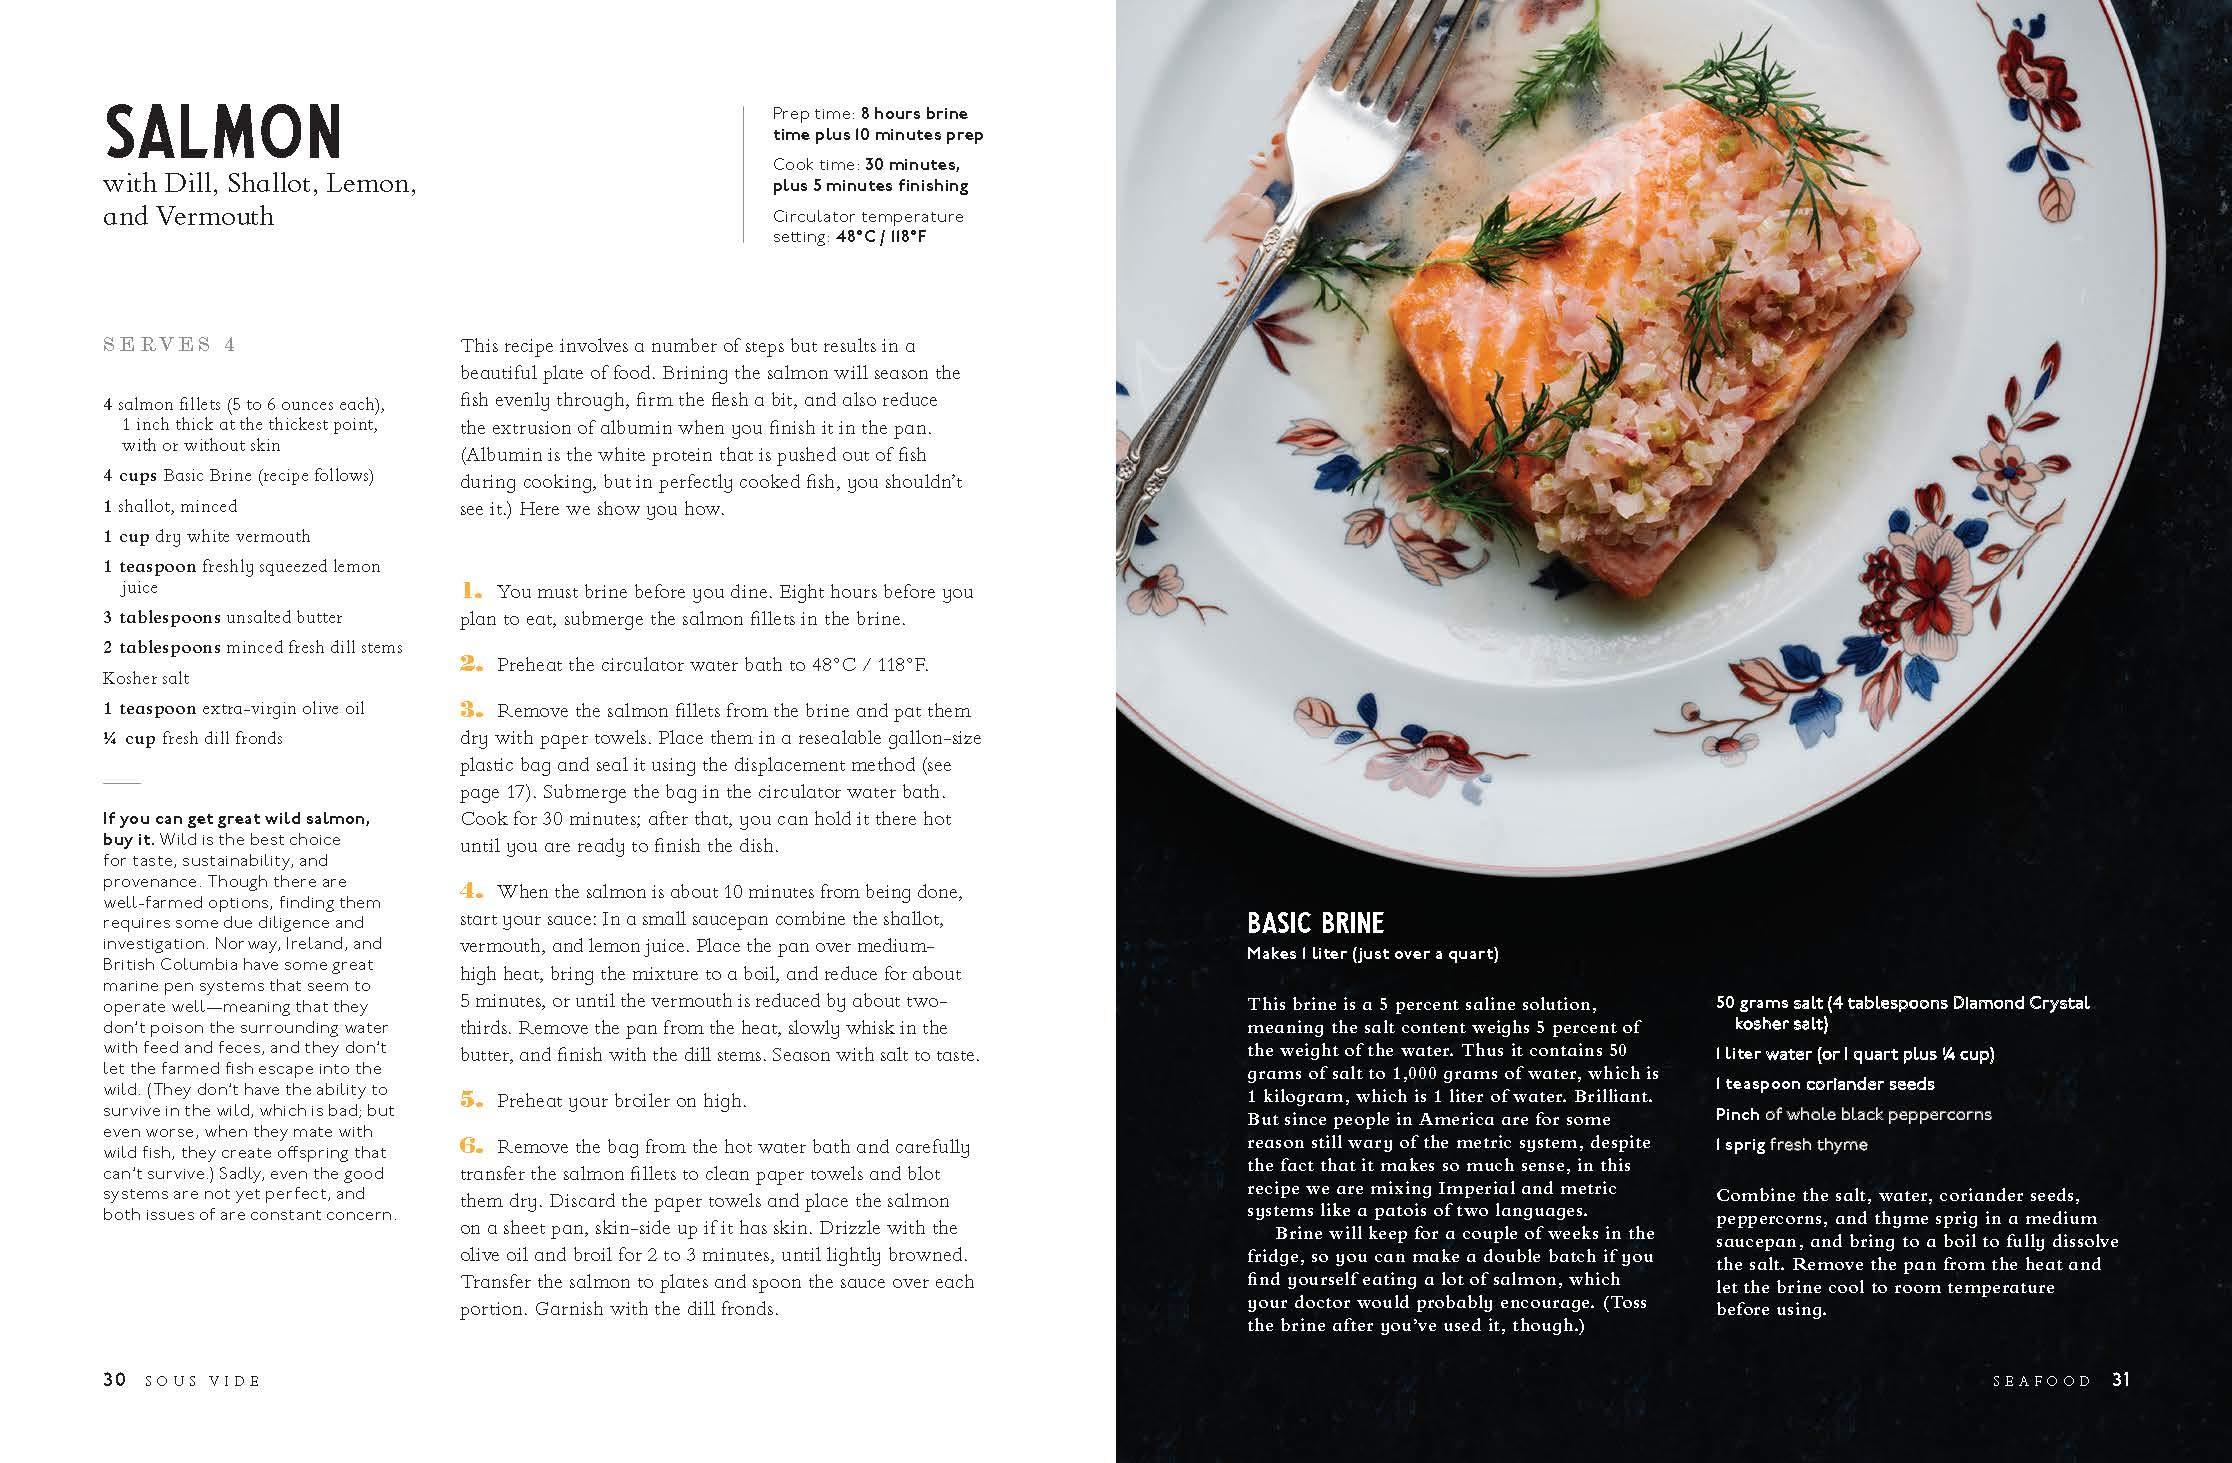 Sous Vide Better Home Cooking A Cookbook Hugh Acheson